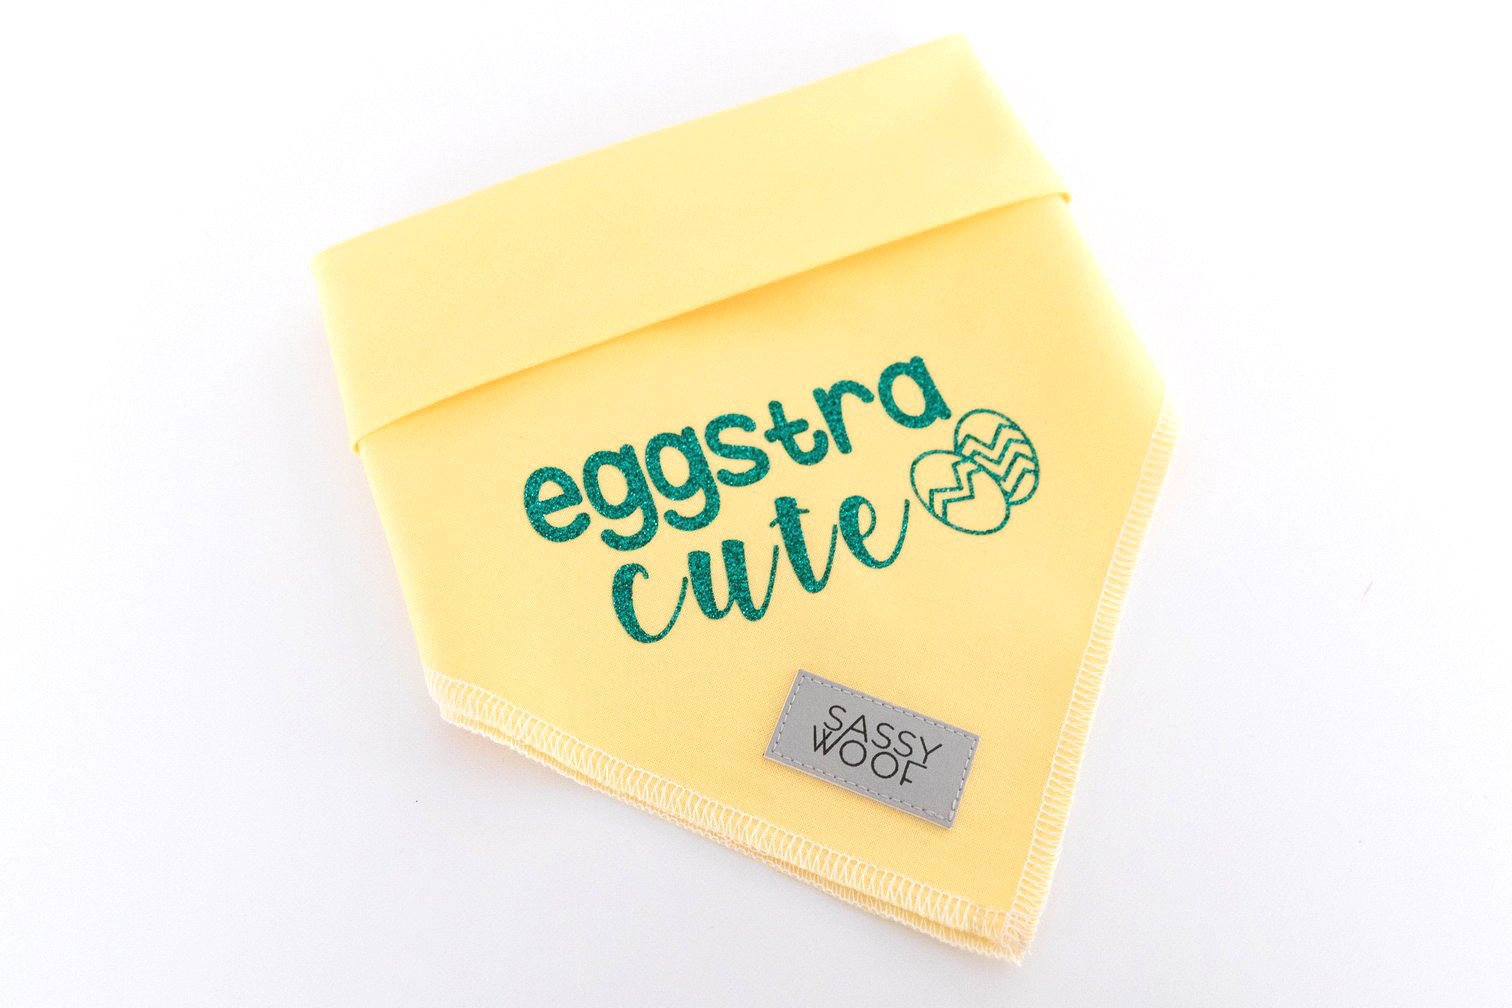 Eggstra Cute Easter Dog Bandana By Sassy Woof on The Dapple: Dog Lifestyle Site